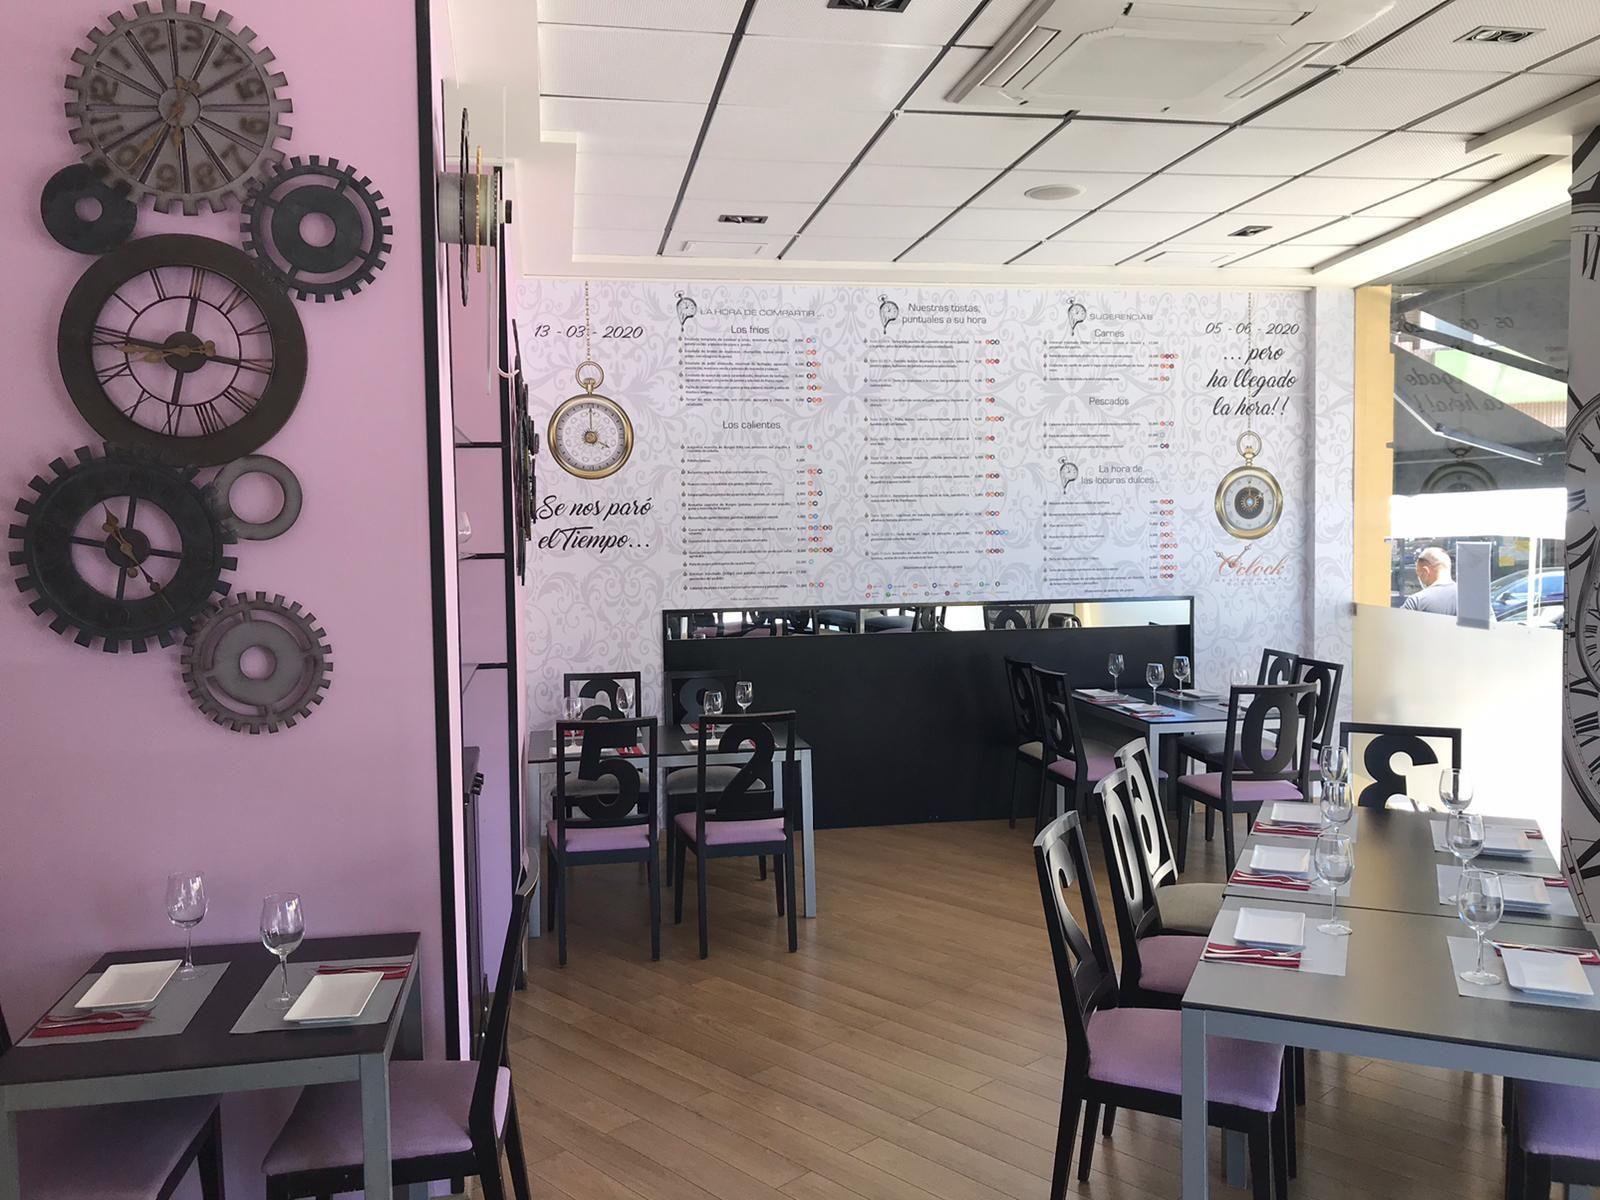 Foto 3 de Restaurante en Valencia | Cafetería Tosteria O´Clock